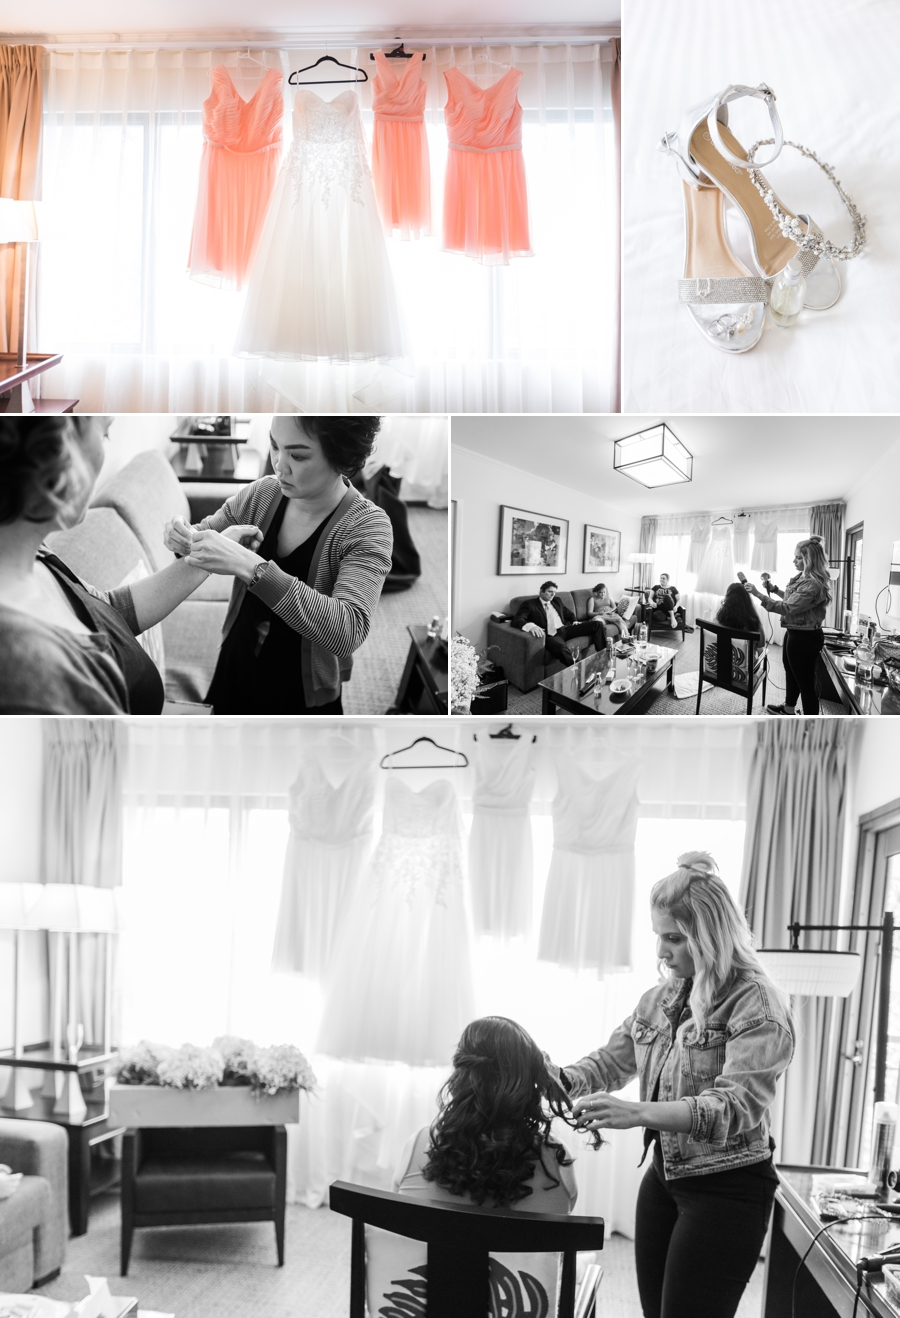 Perth-Australia-Wedding-4-1.jpg